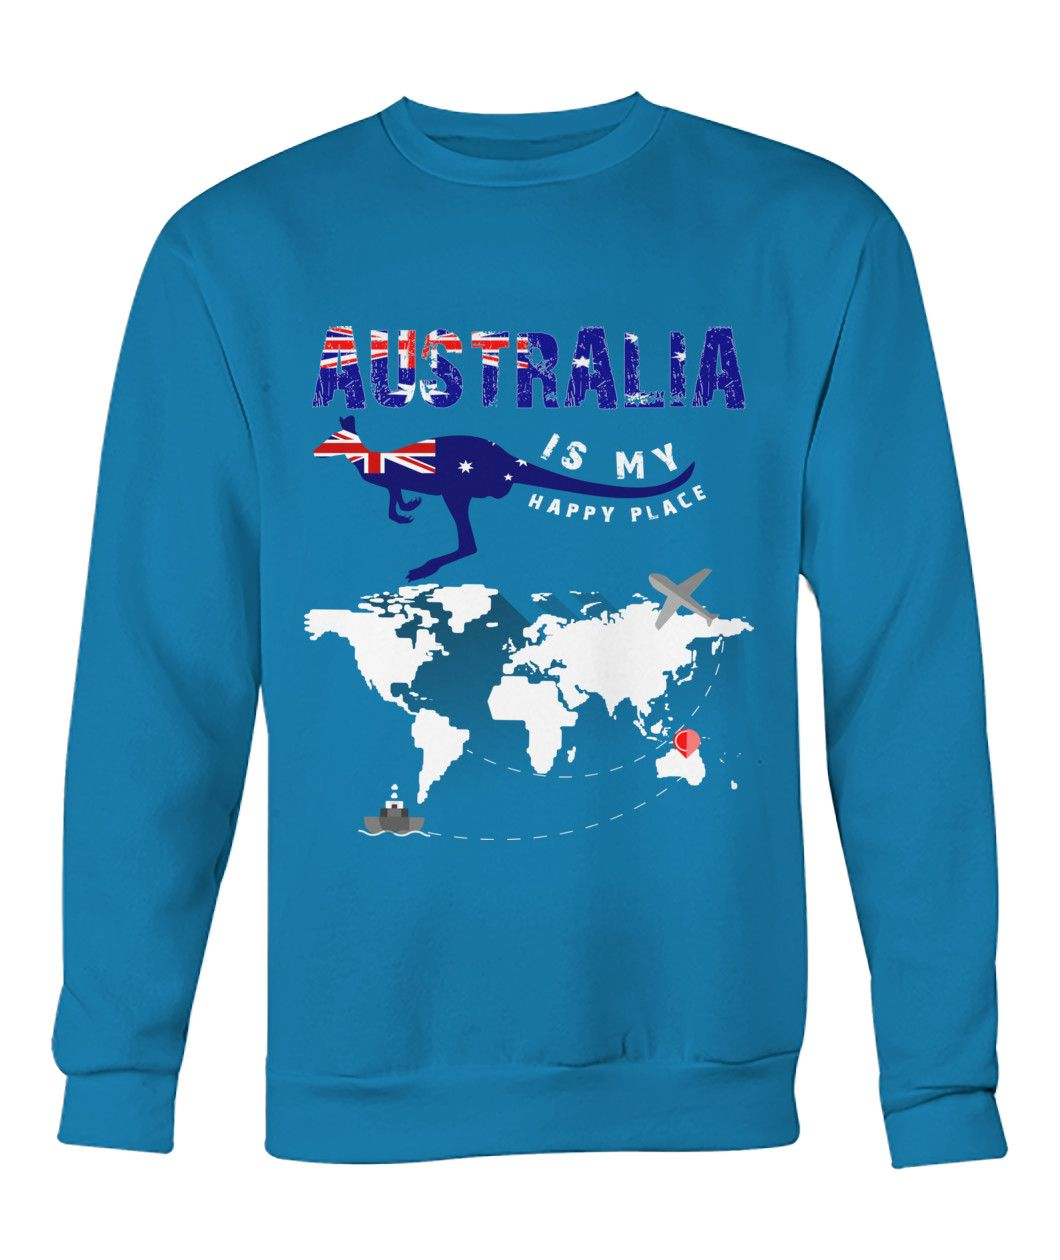 Australia lover christmas sweater sweatshirt jumper